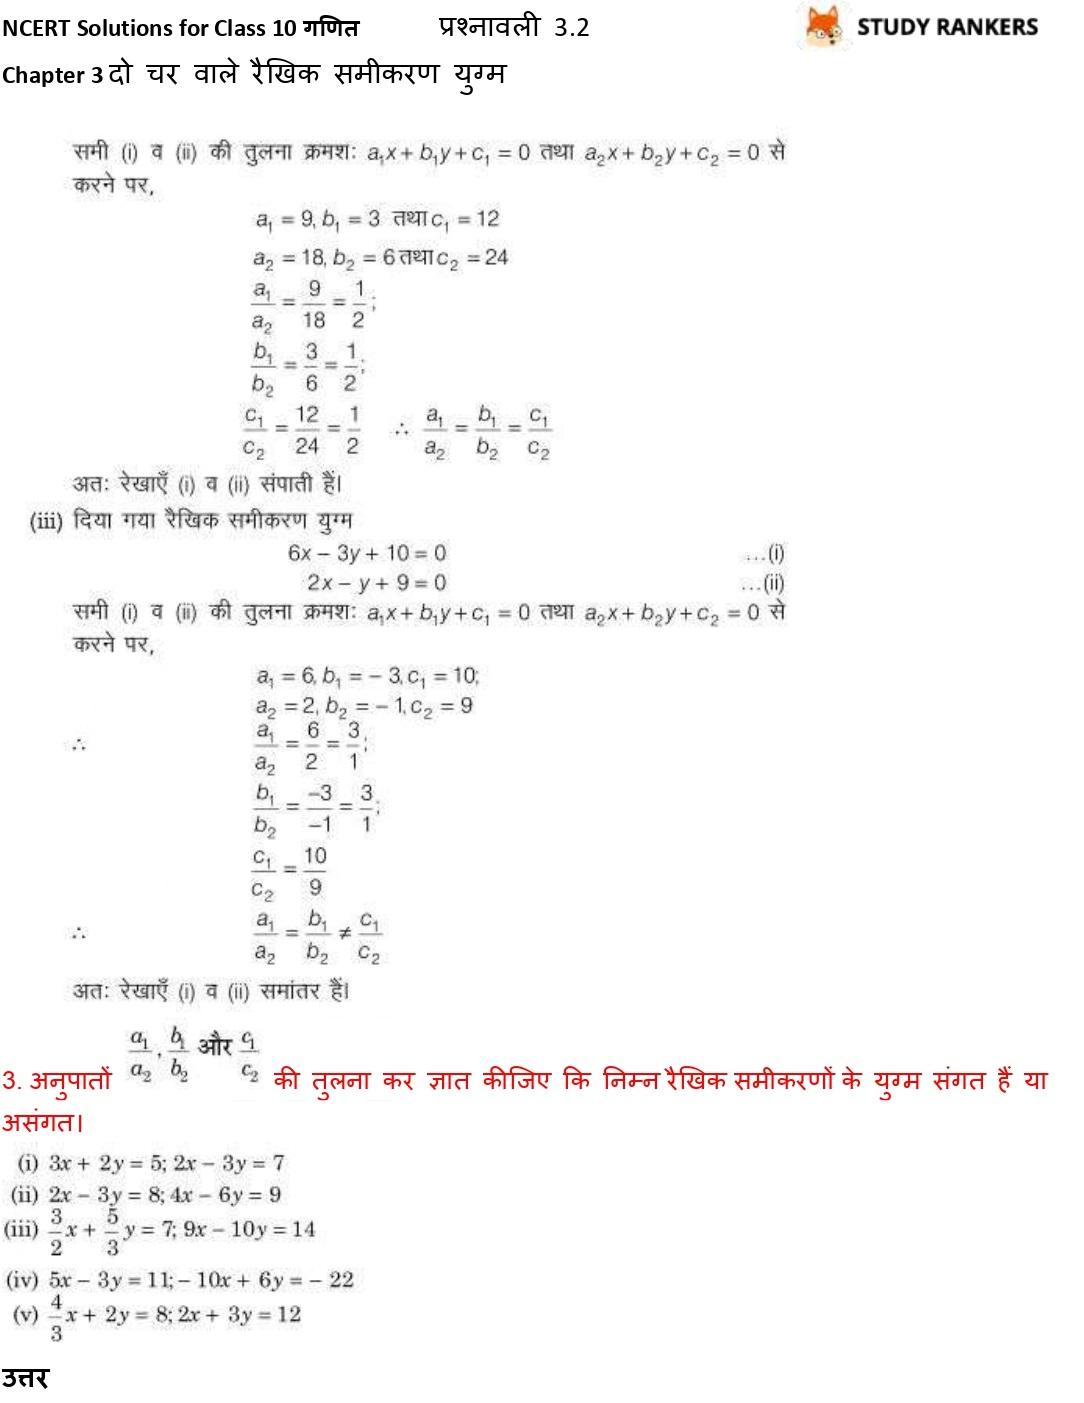 NCERT Solutions for Class 10 Maths Chapter 3 दो चर वाले रैखिक समीकरण युग्म प्रश्नावली 3.2 Part 4